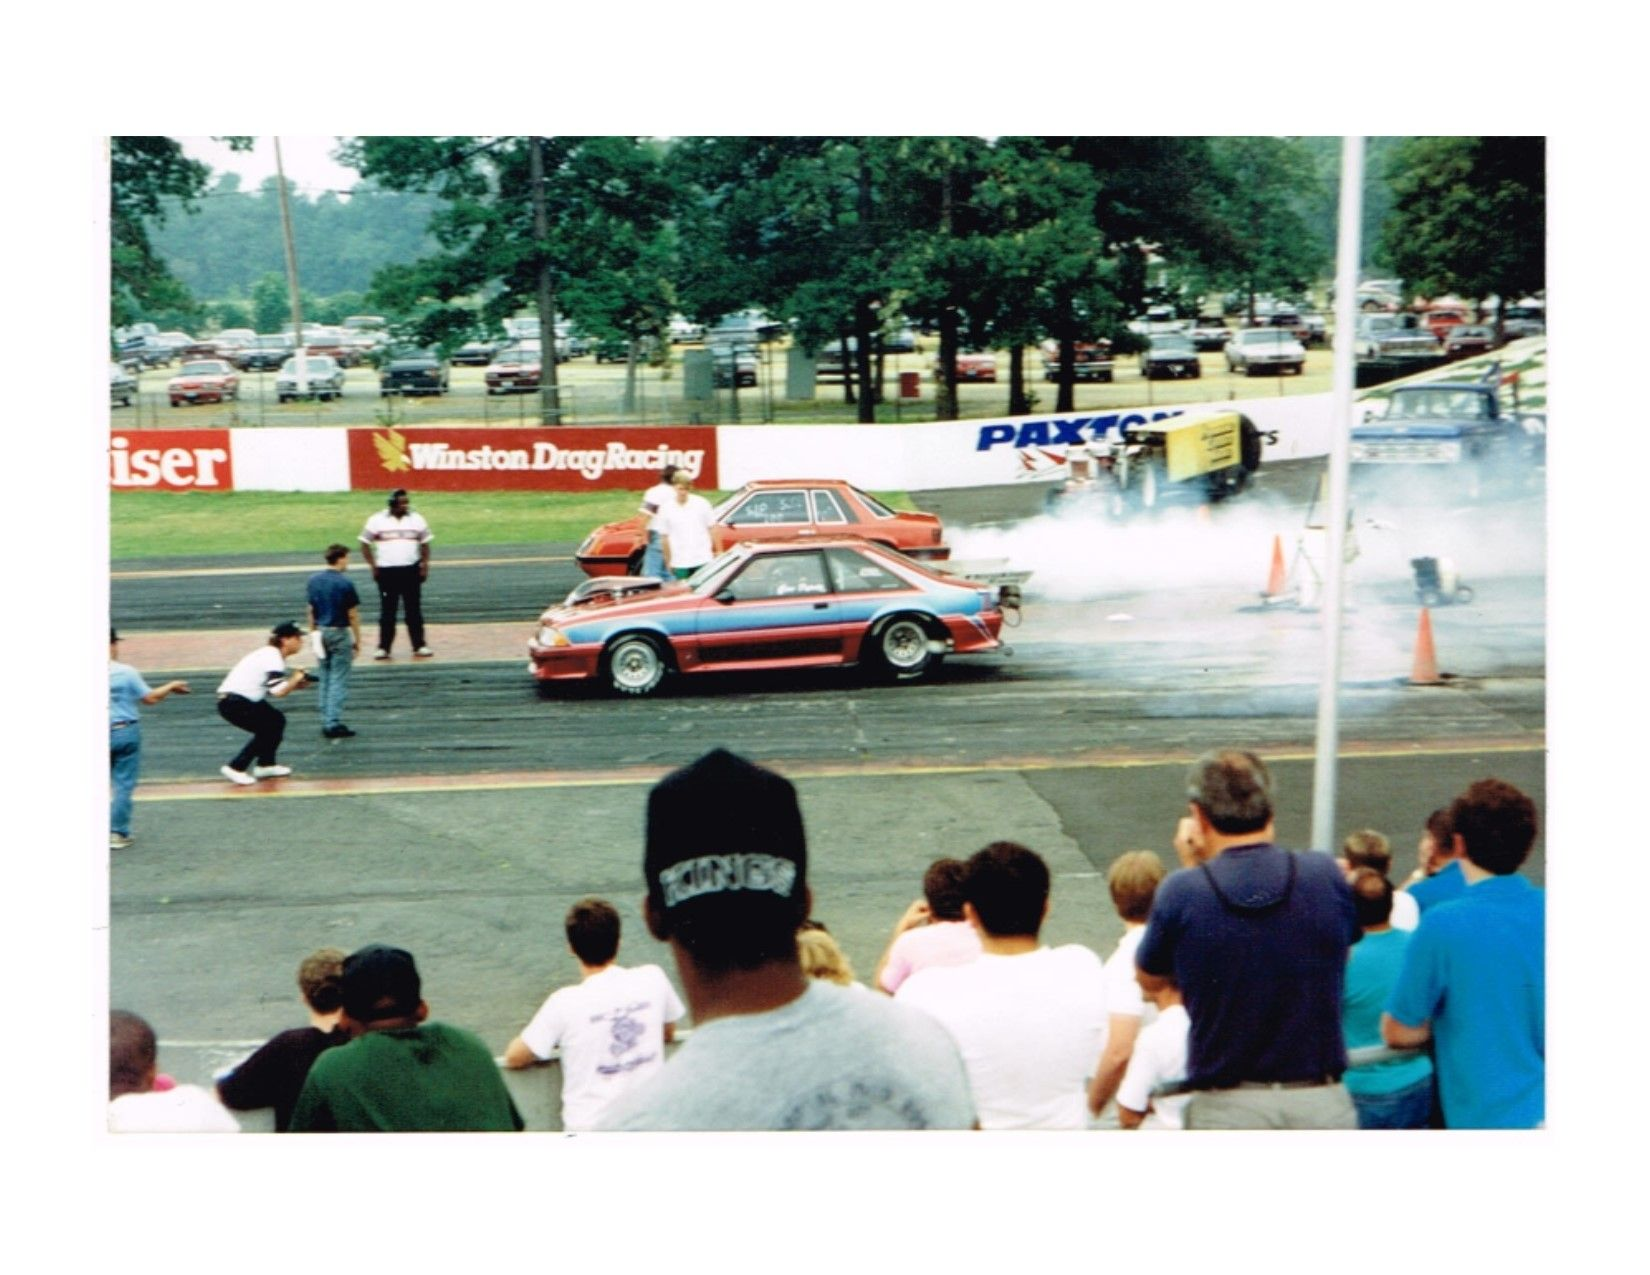 Joe Amato Joe S House Of Speed Old Days Racing Gene Deputy Racing Olds Winston